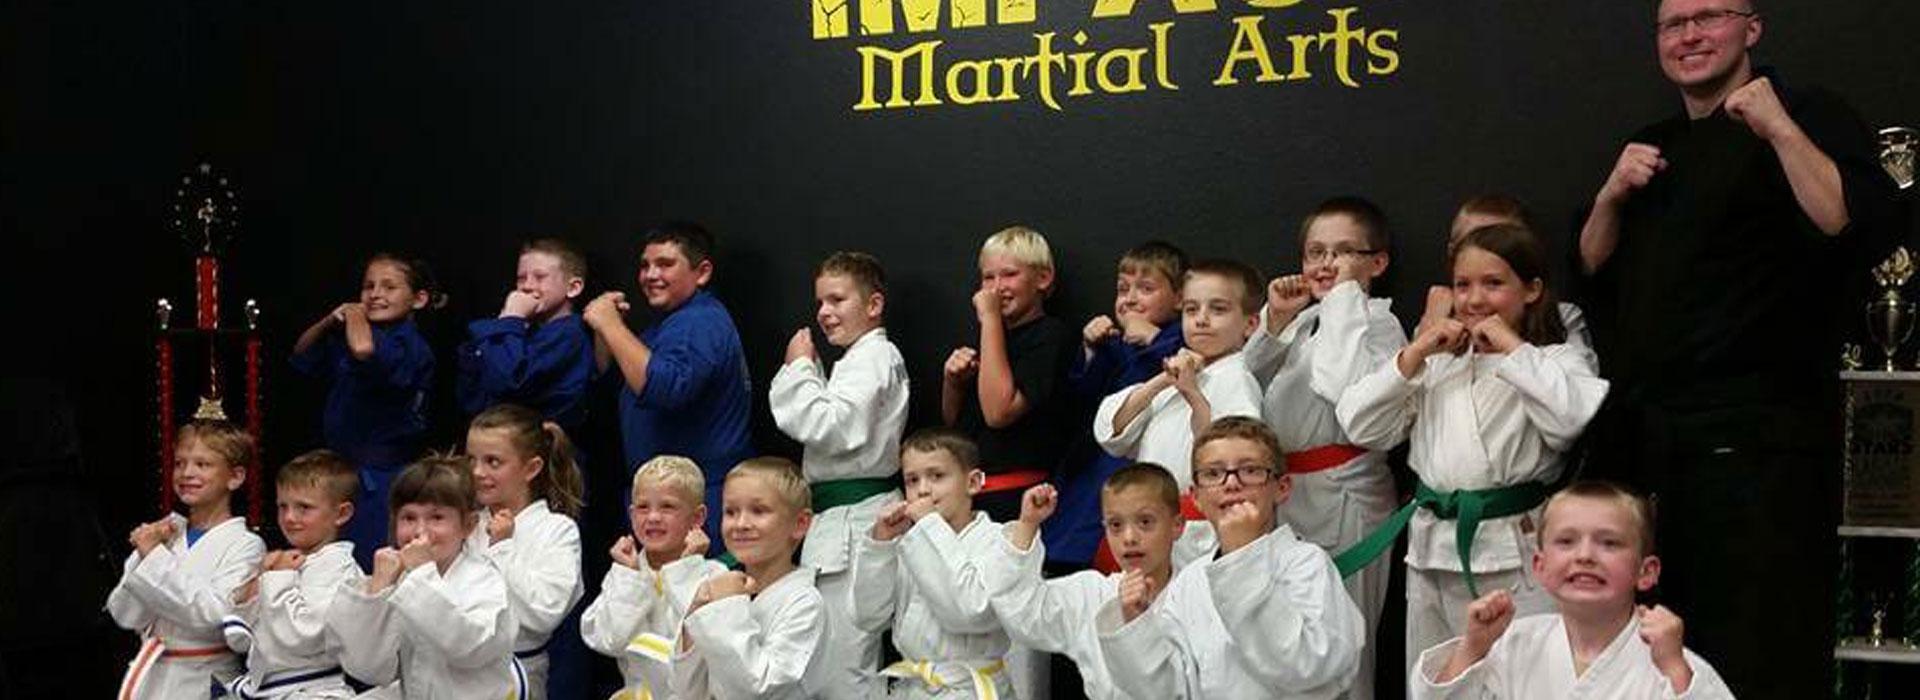 Kids Martial Arts Classes in Oshkosh, WI close to Fox Cities